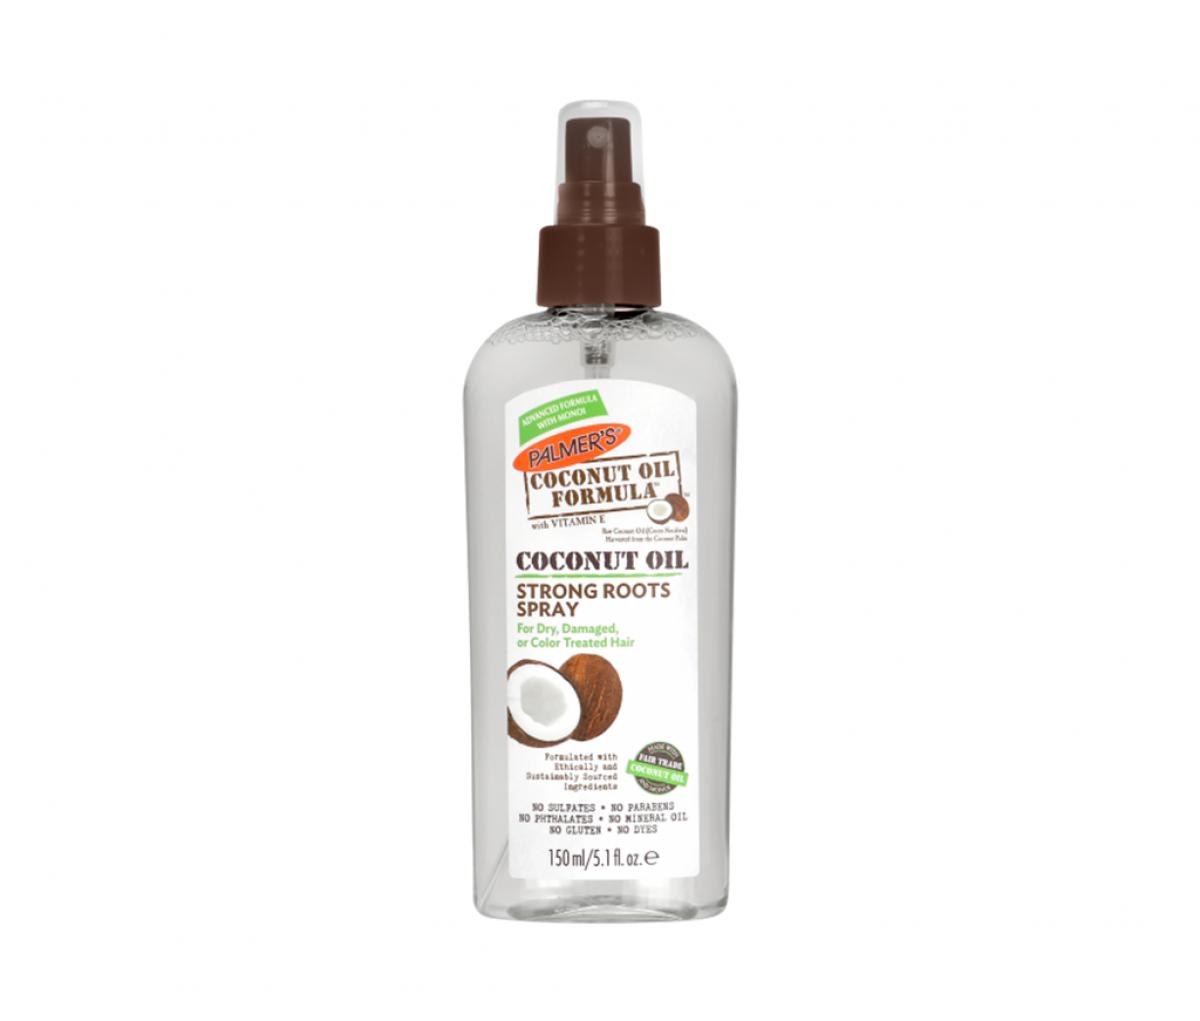 Palmers coconut oil formula strang root spray